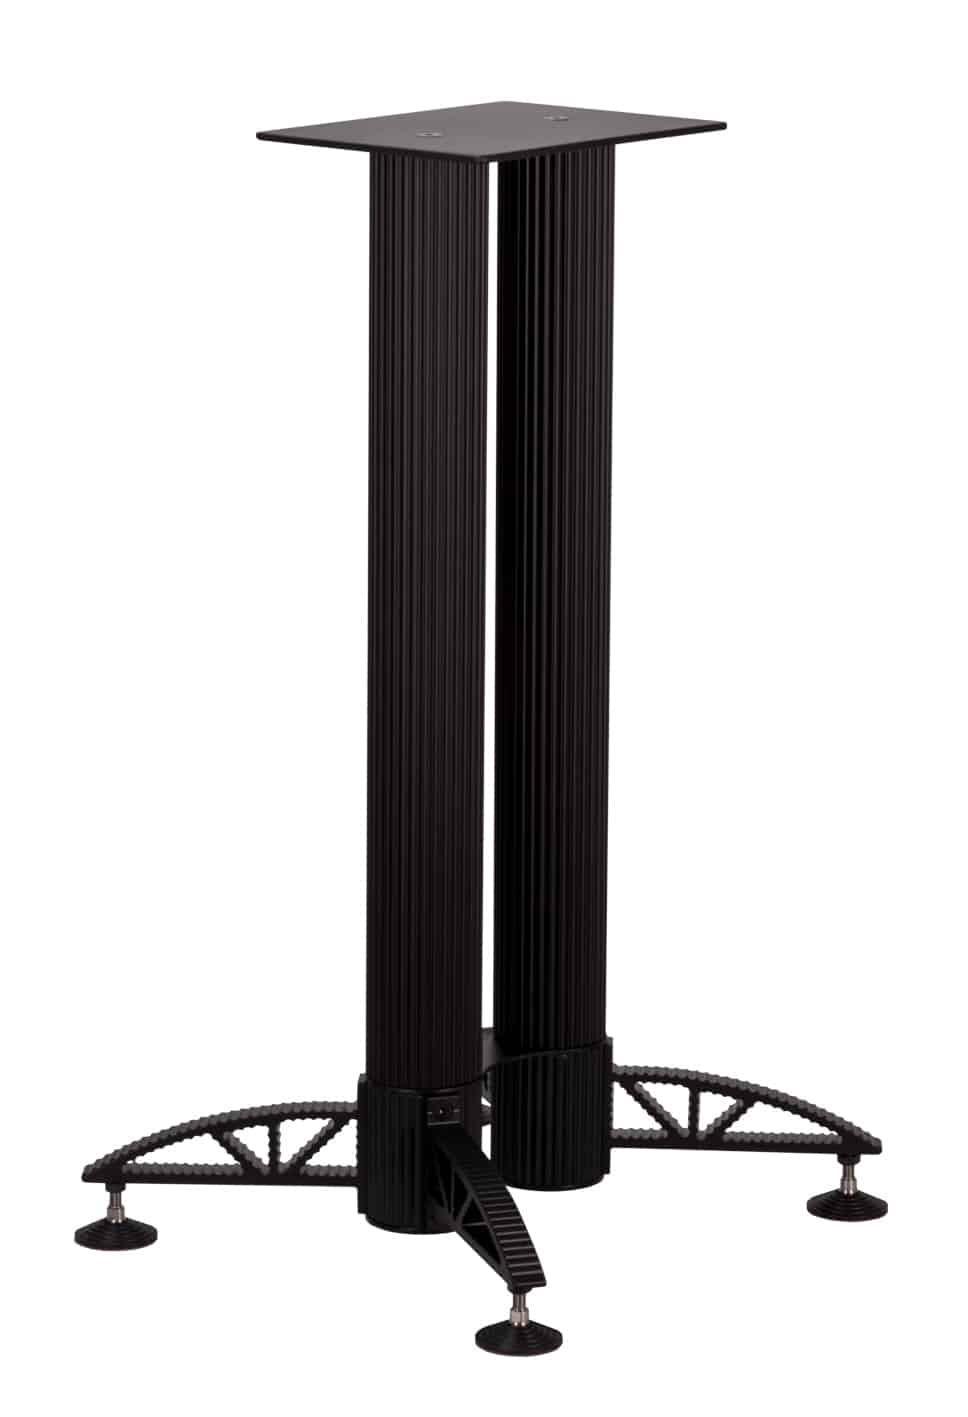 Loudspeaker Stand Model 6 Image